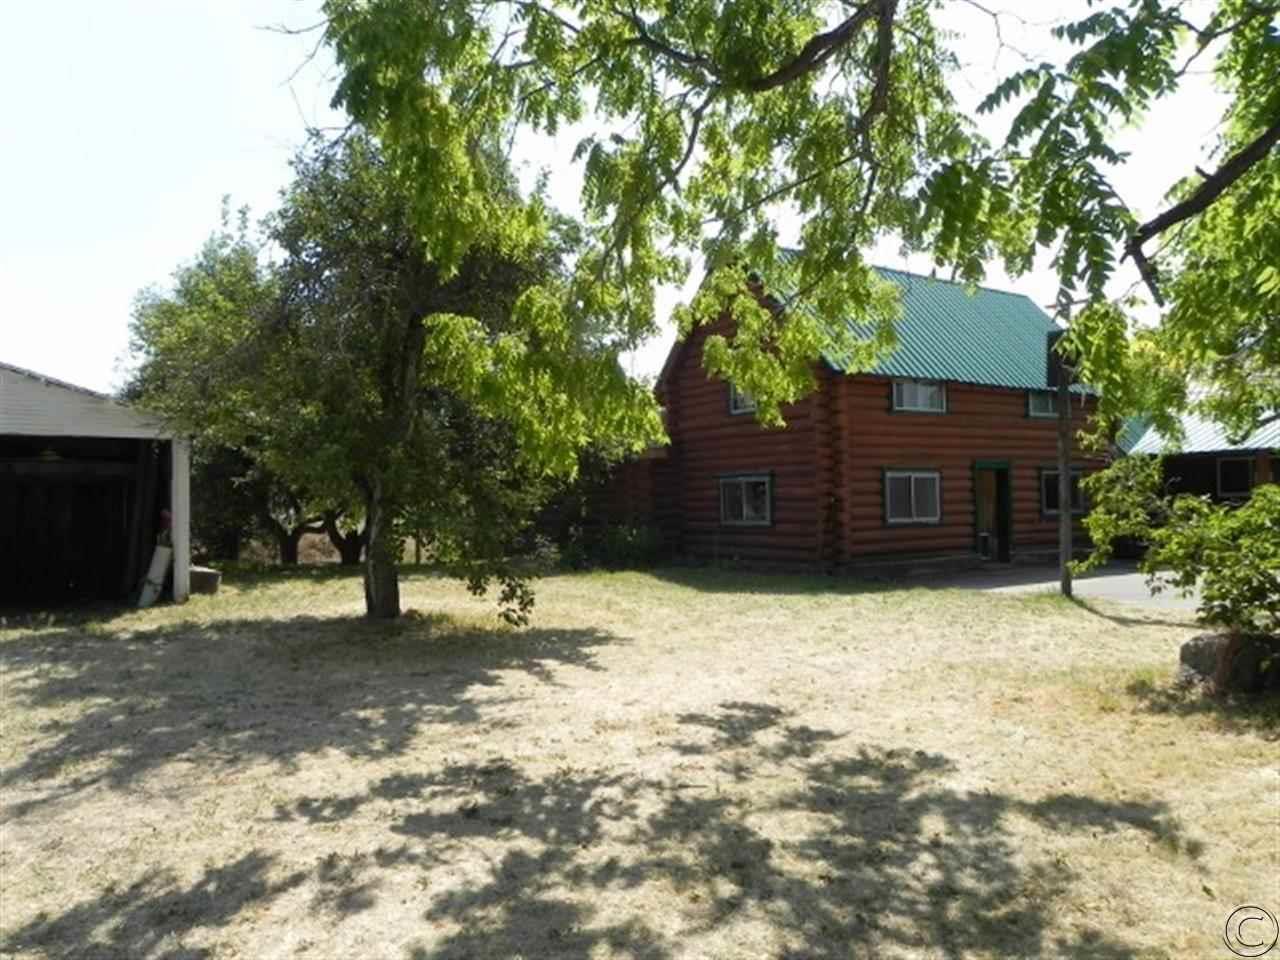 Real Estate for Sale, ListingId: 32713056, Arlee,MT59821